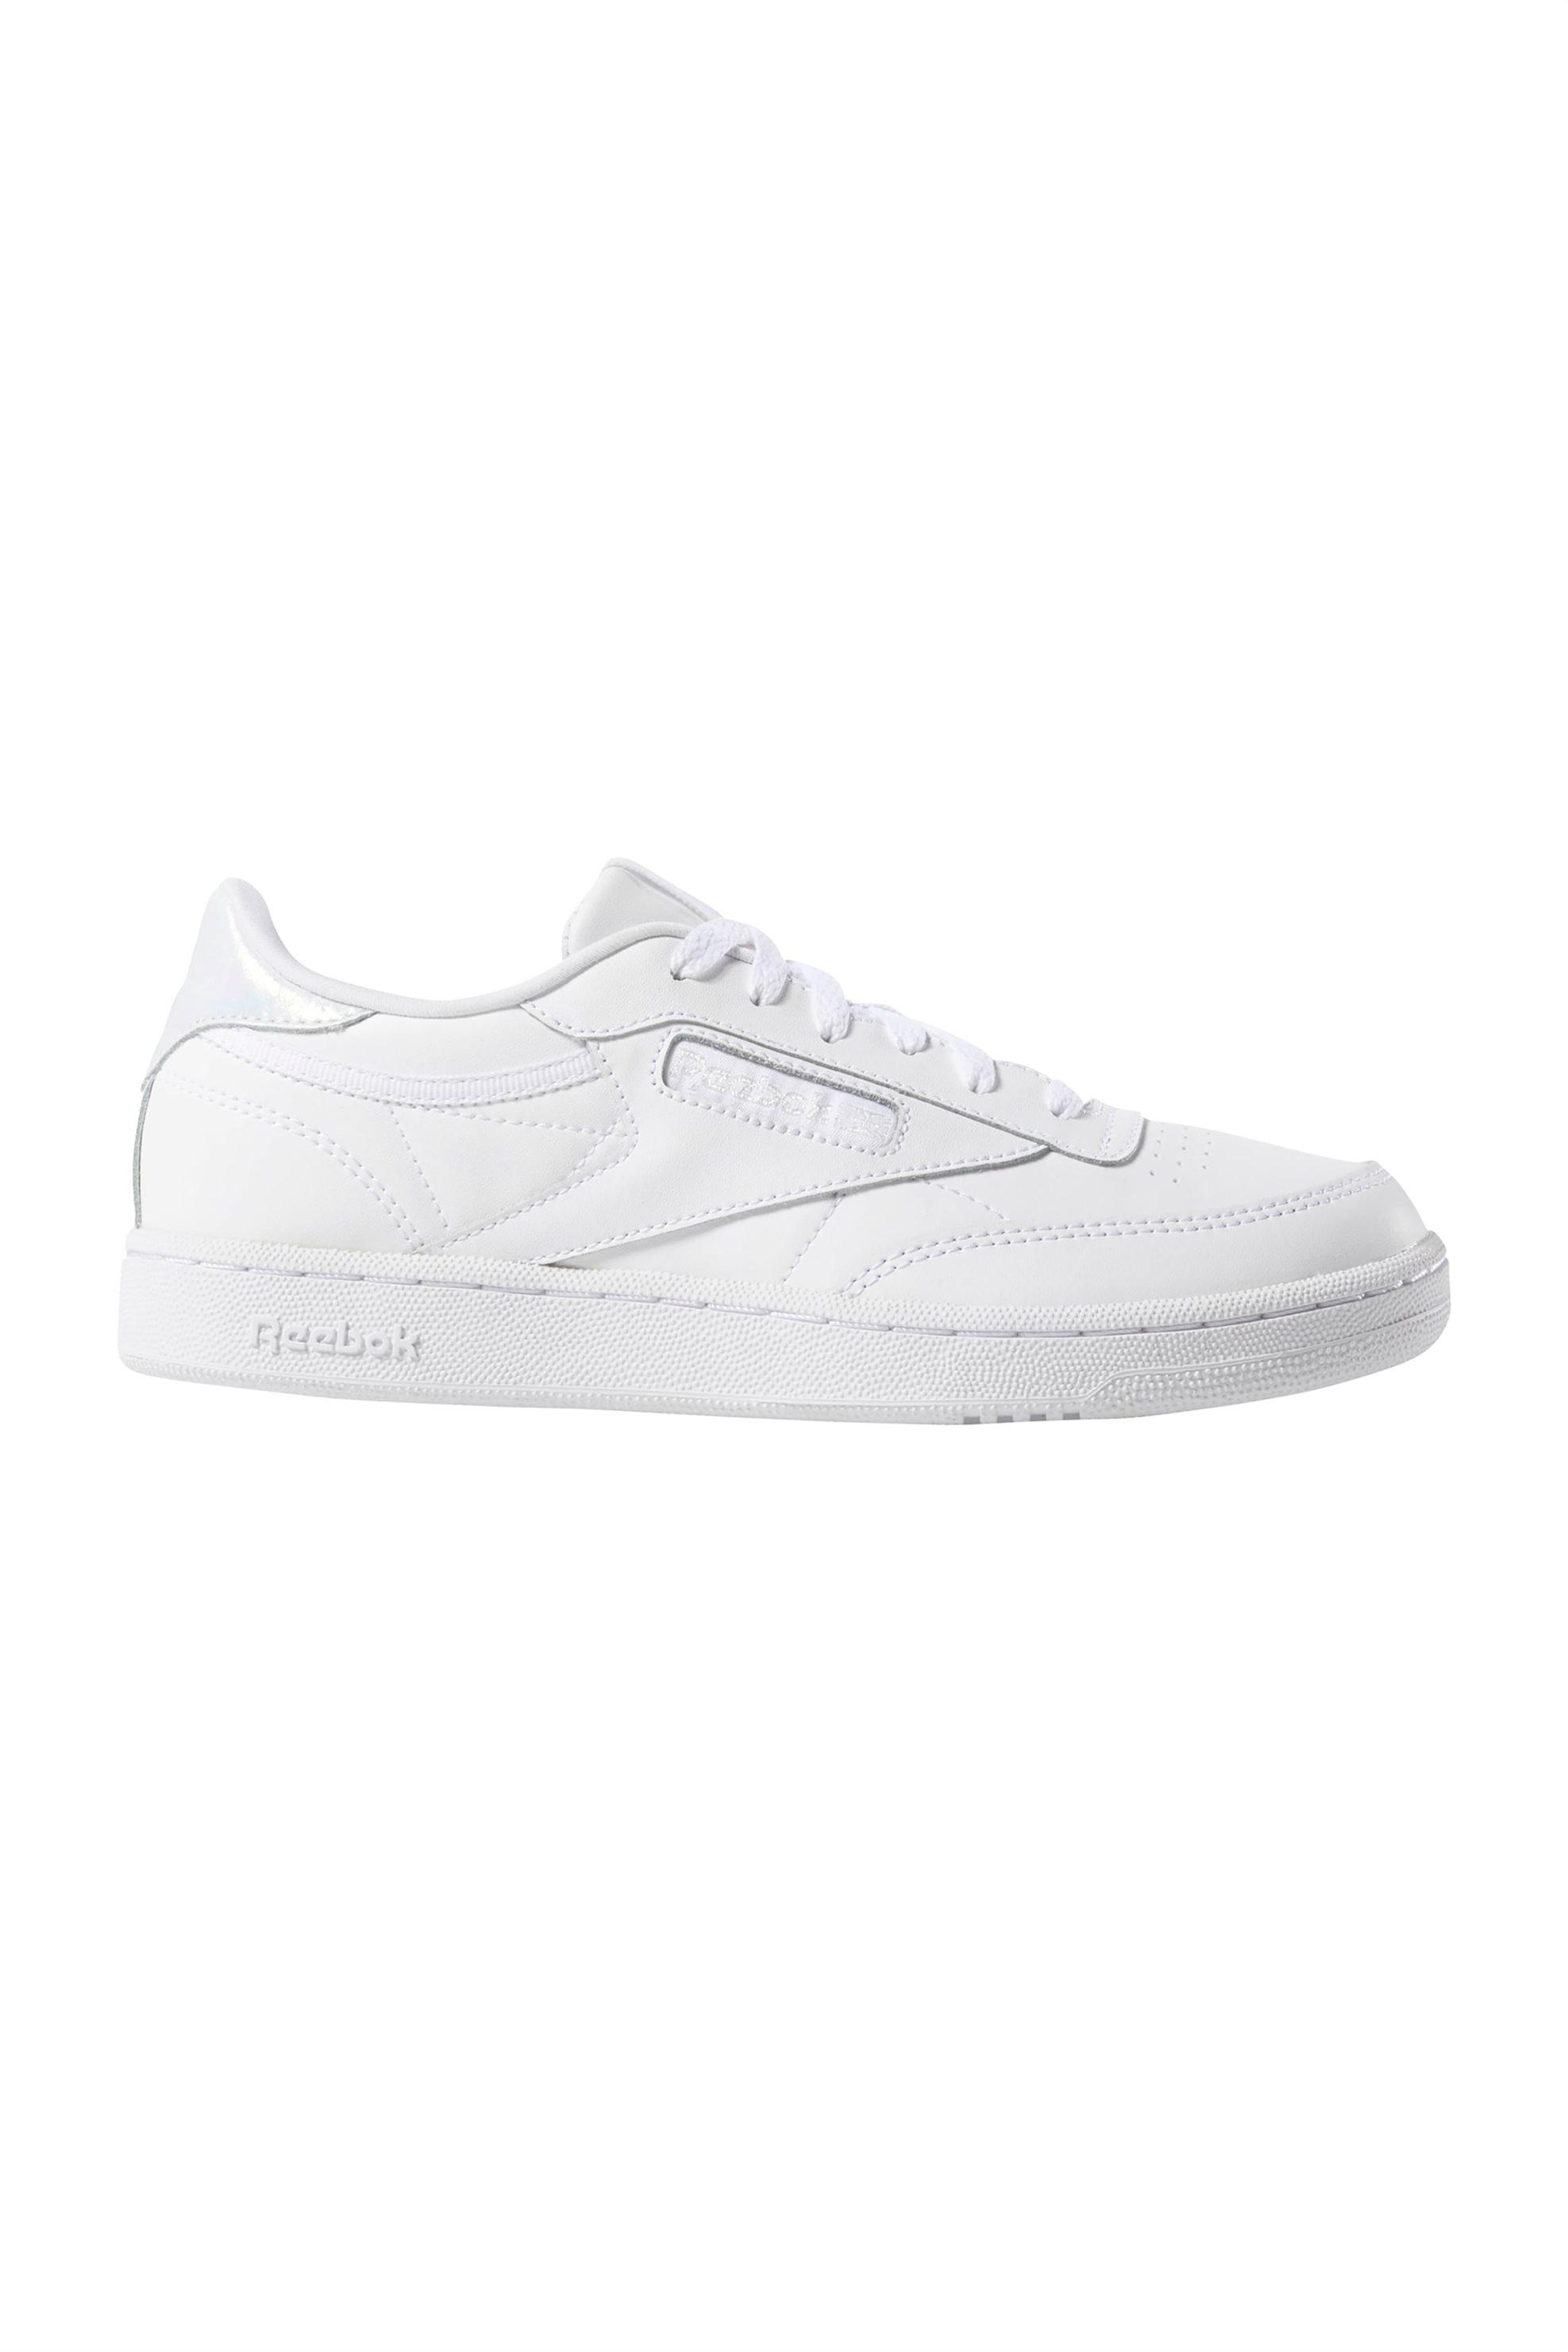 76452a02e46 Notos Reebok γυναικεία sneakers Club C – DV4528 – Λευκό